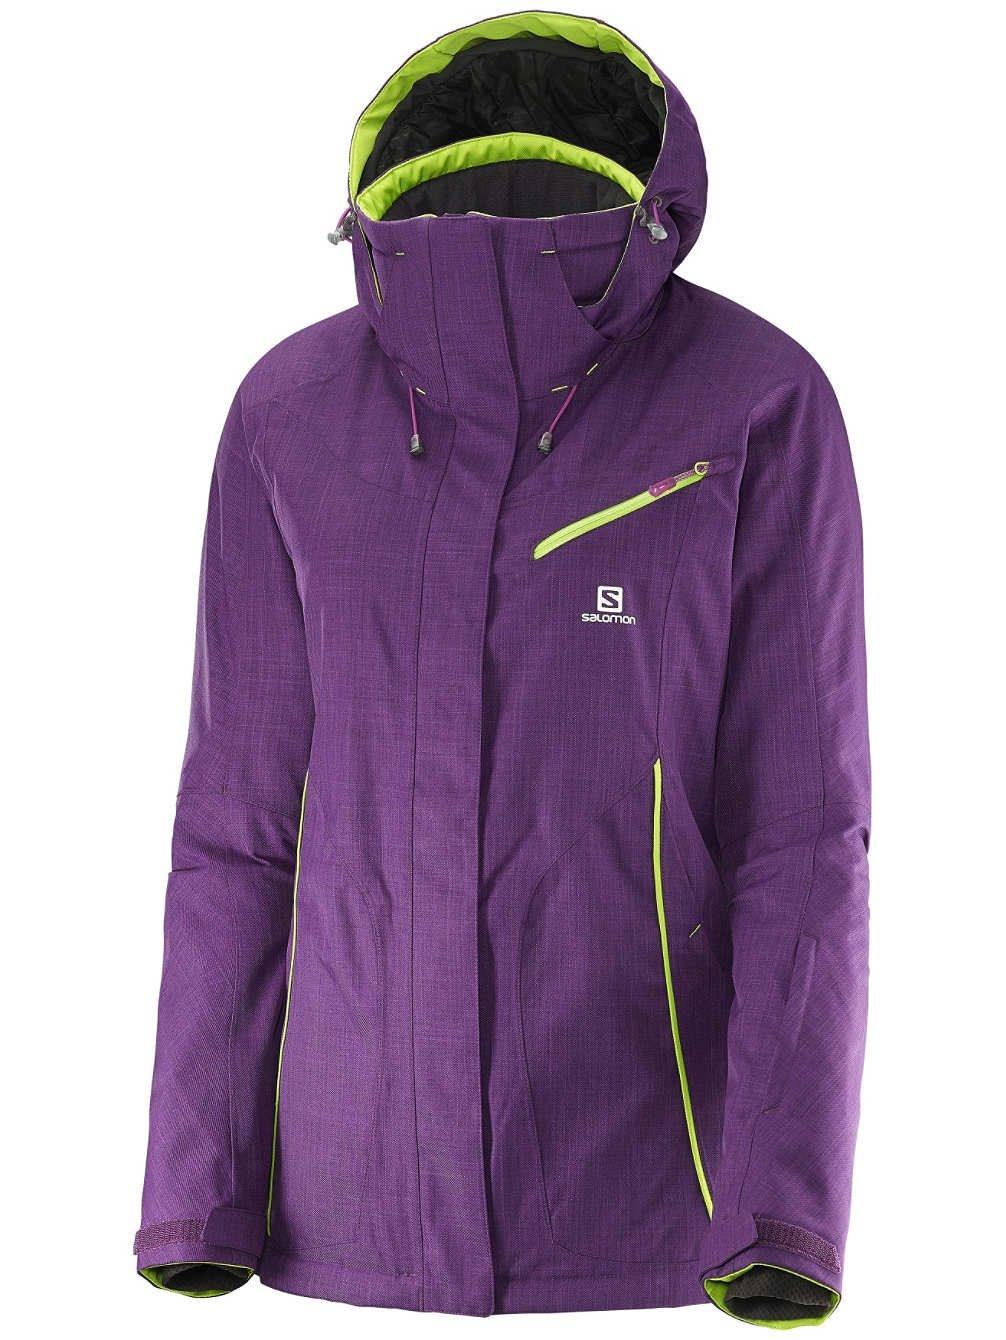 Damen Snowboard Jacke Salomon Fantasy Jacket bestellen